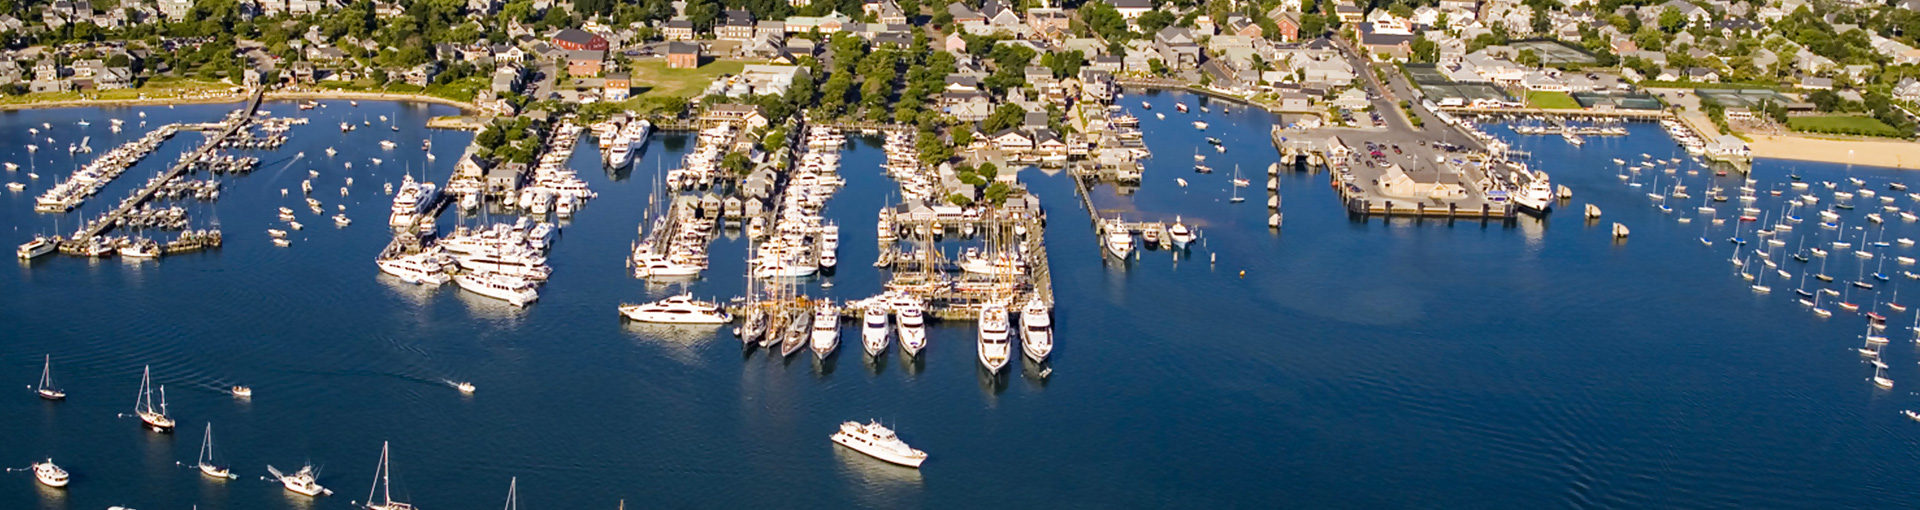 Nantucket Island, Massachusetts Marina